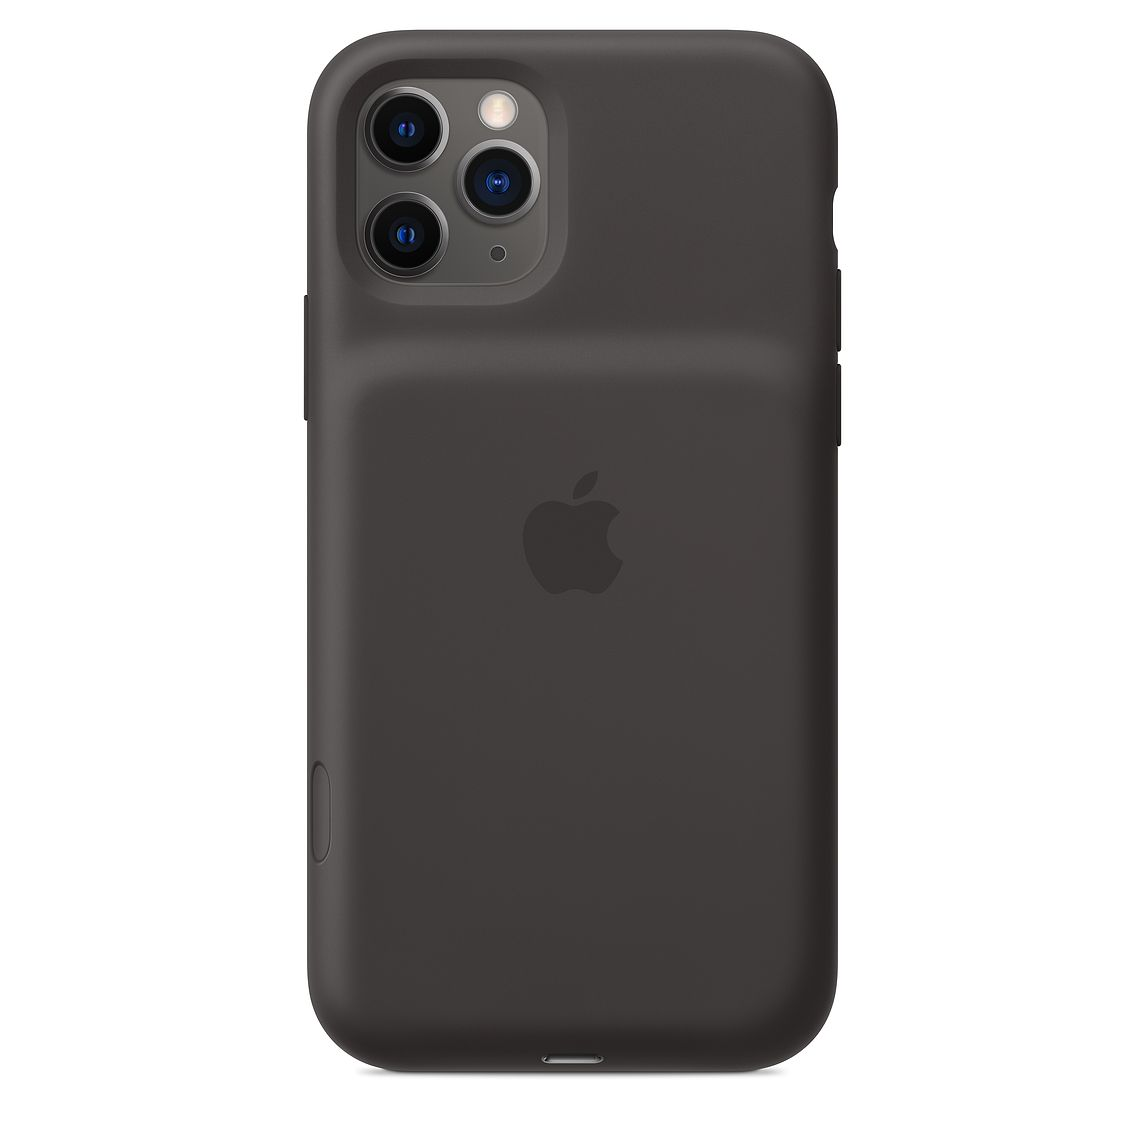 Funda Smart Battery Case para el iPhone 11 Pro Max Negro